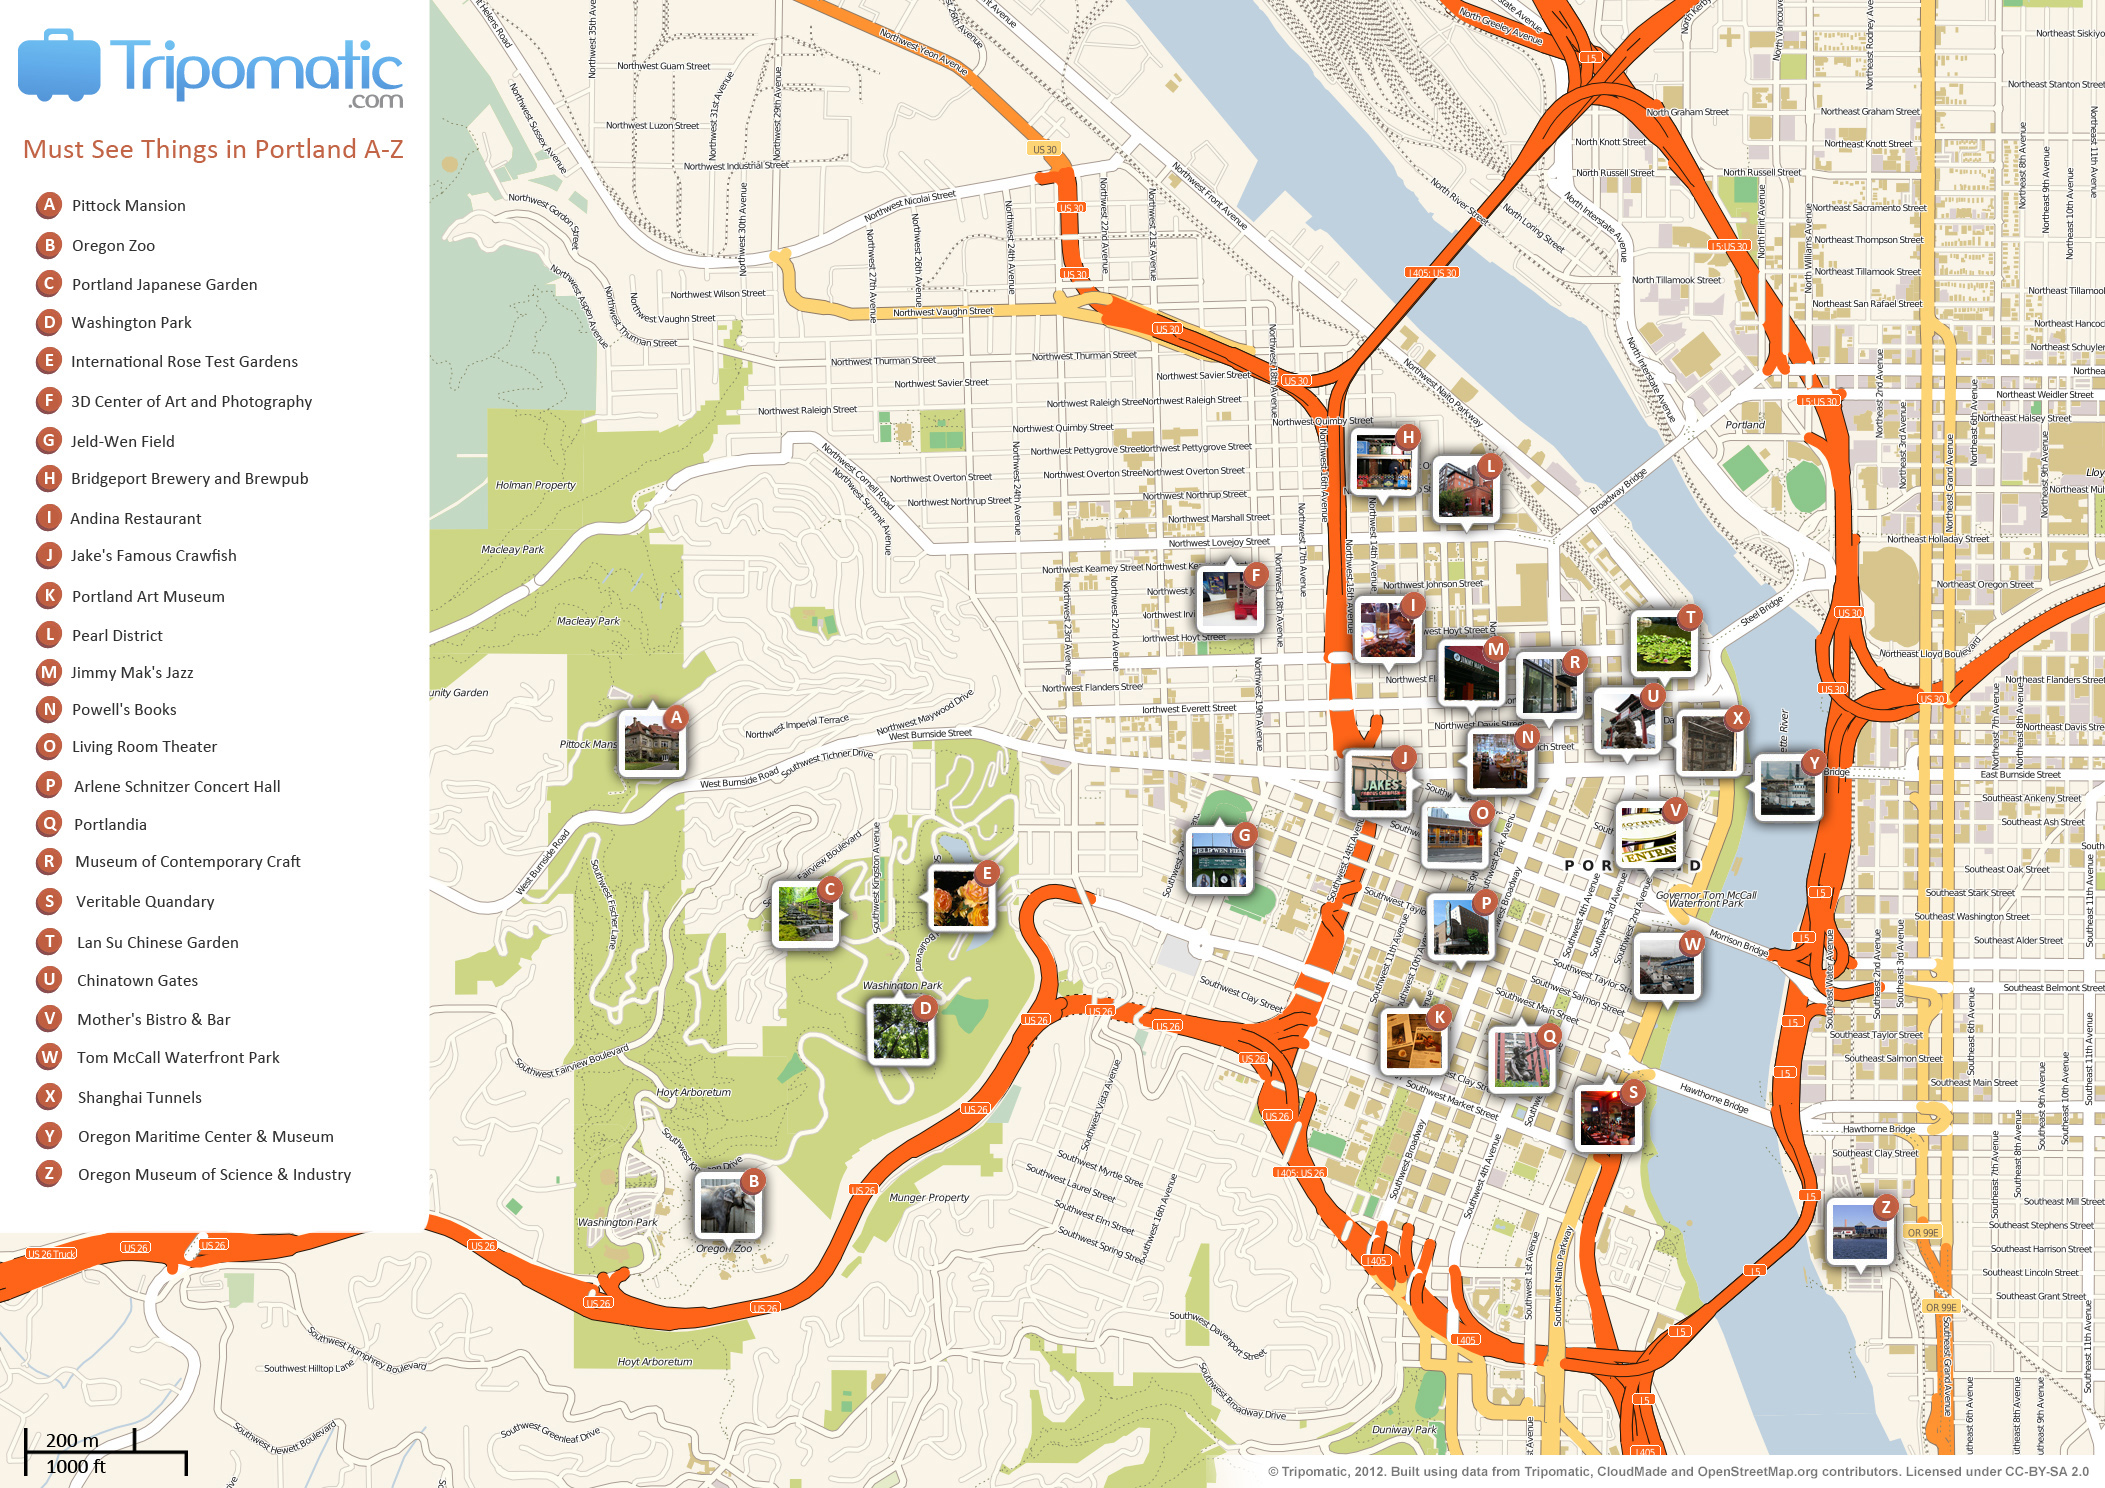 Portland Beer Tour Map